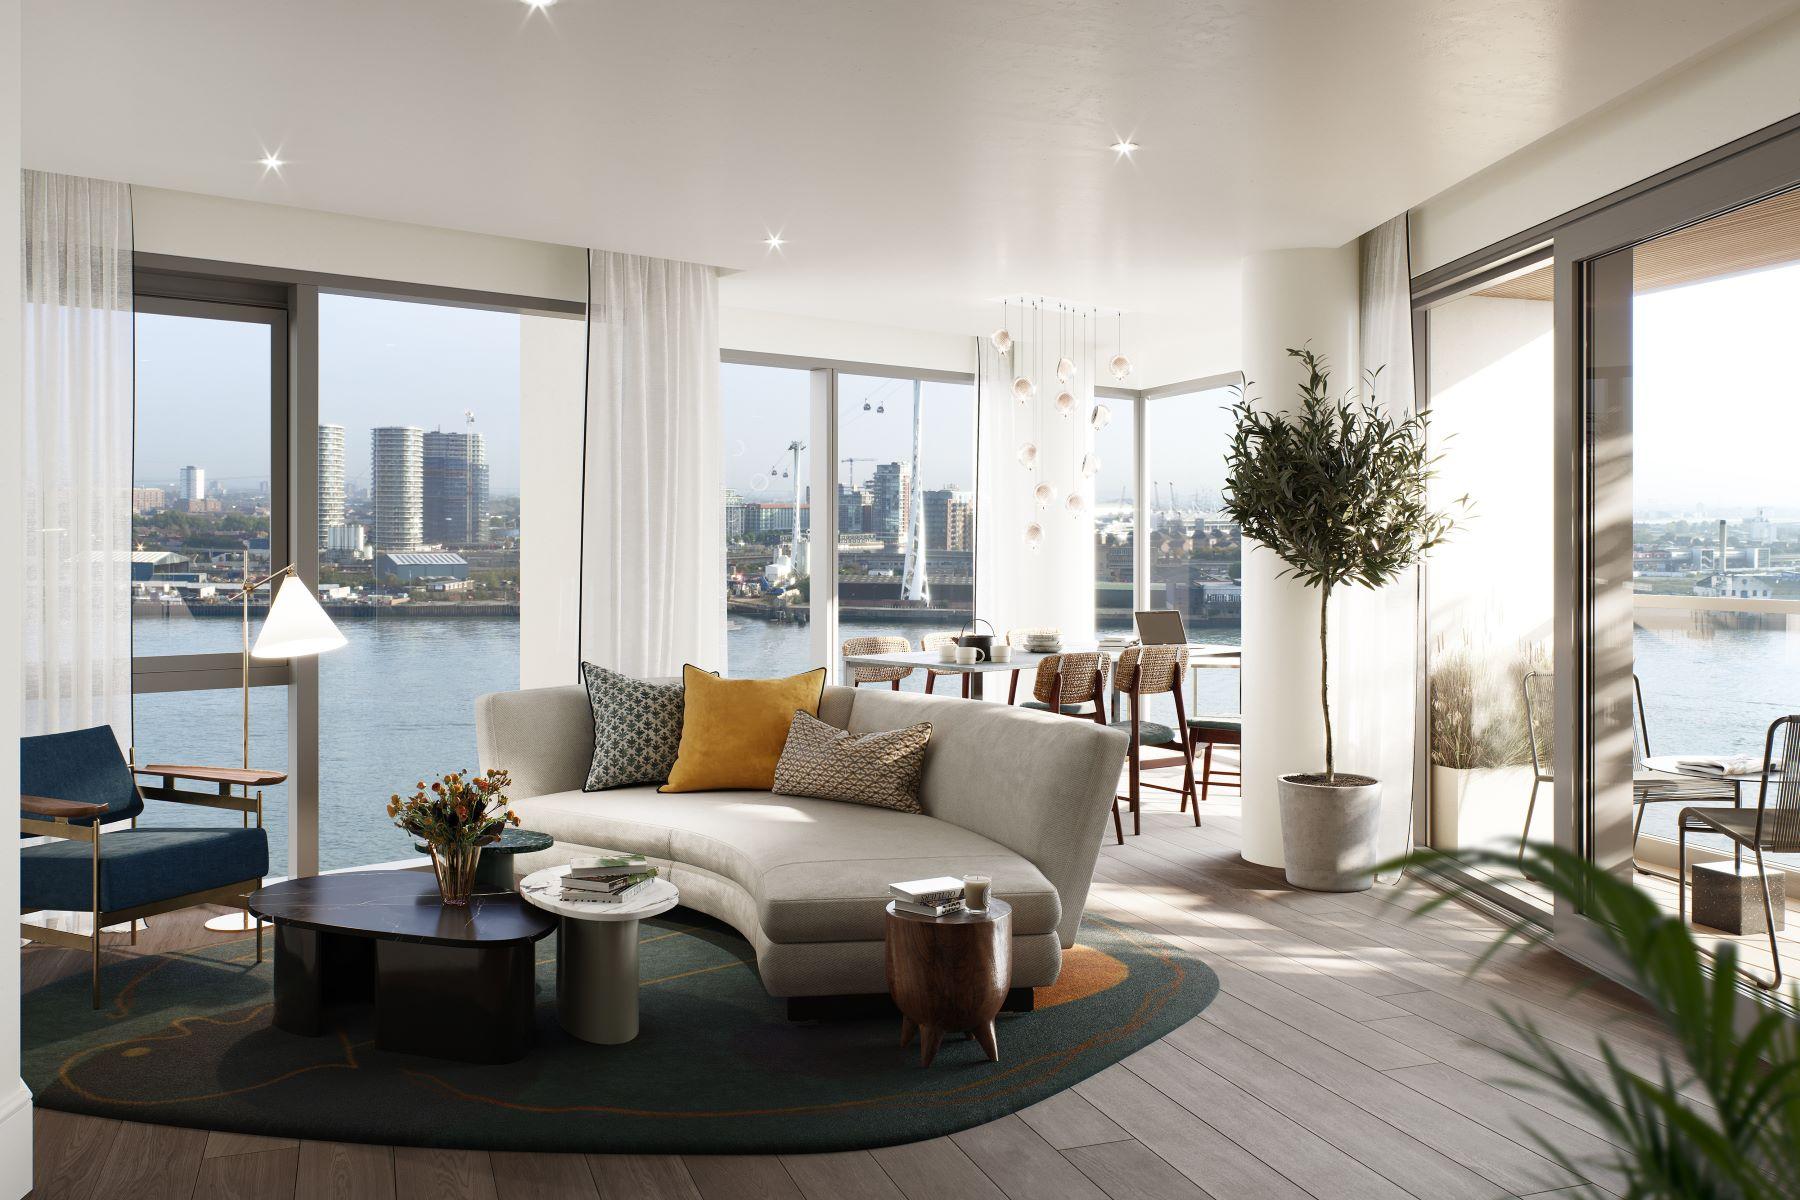 Apartments for Sale at Greenwich Peninsula Building 3 (17.04), Upper Riverside London, England SE10 0SQ United Kingdom